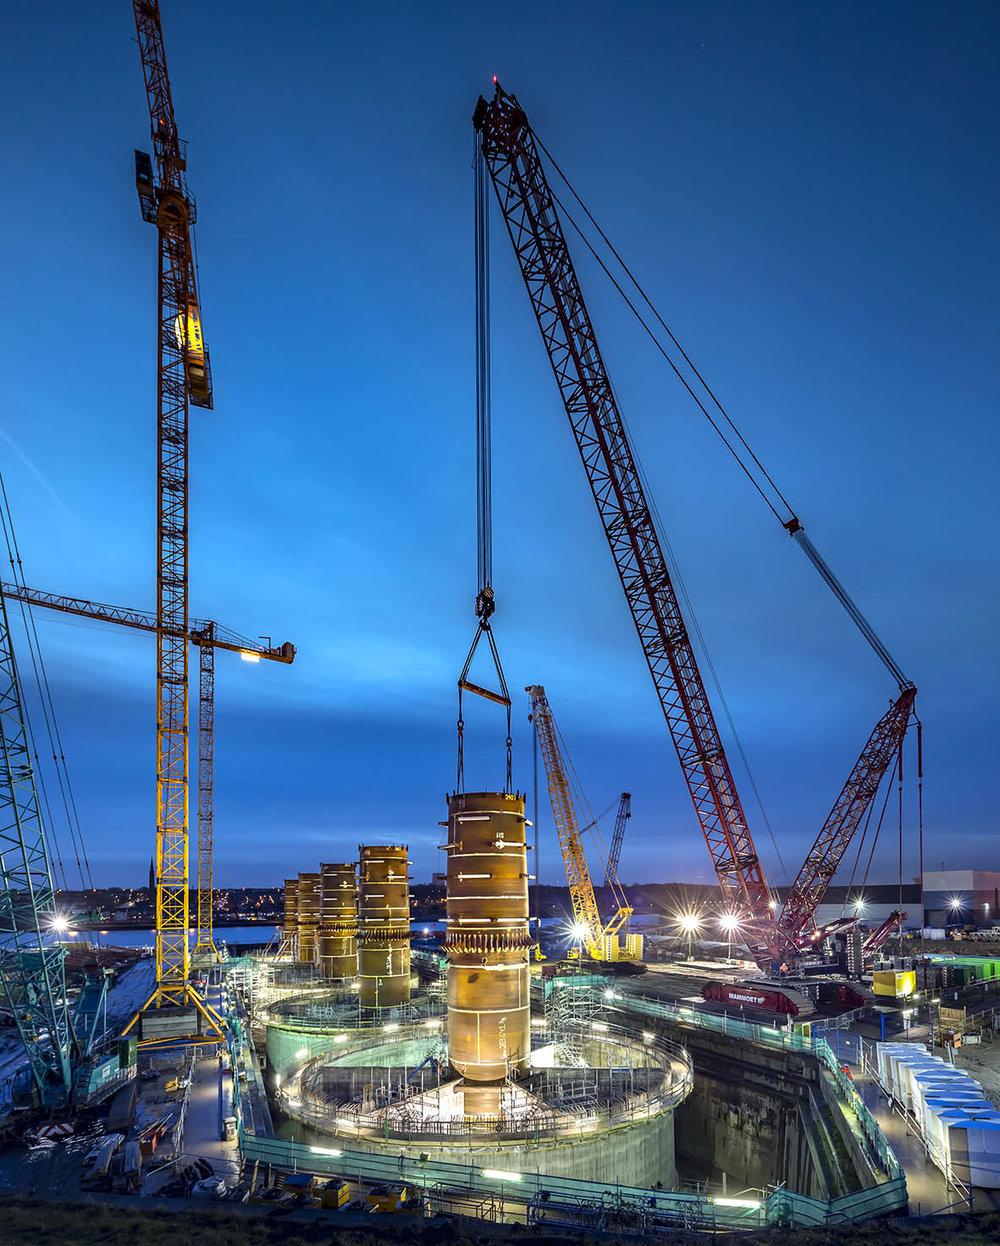 Gravity base foundations for EDF wind farm.